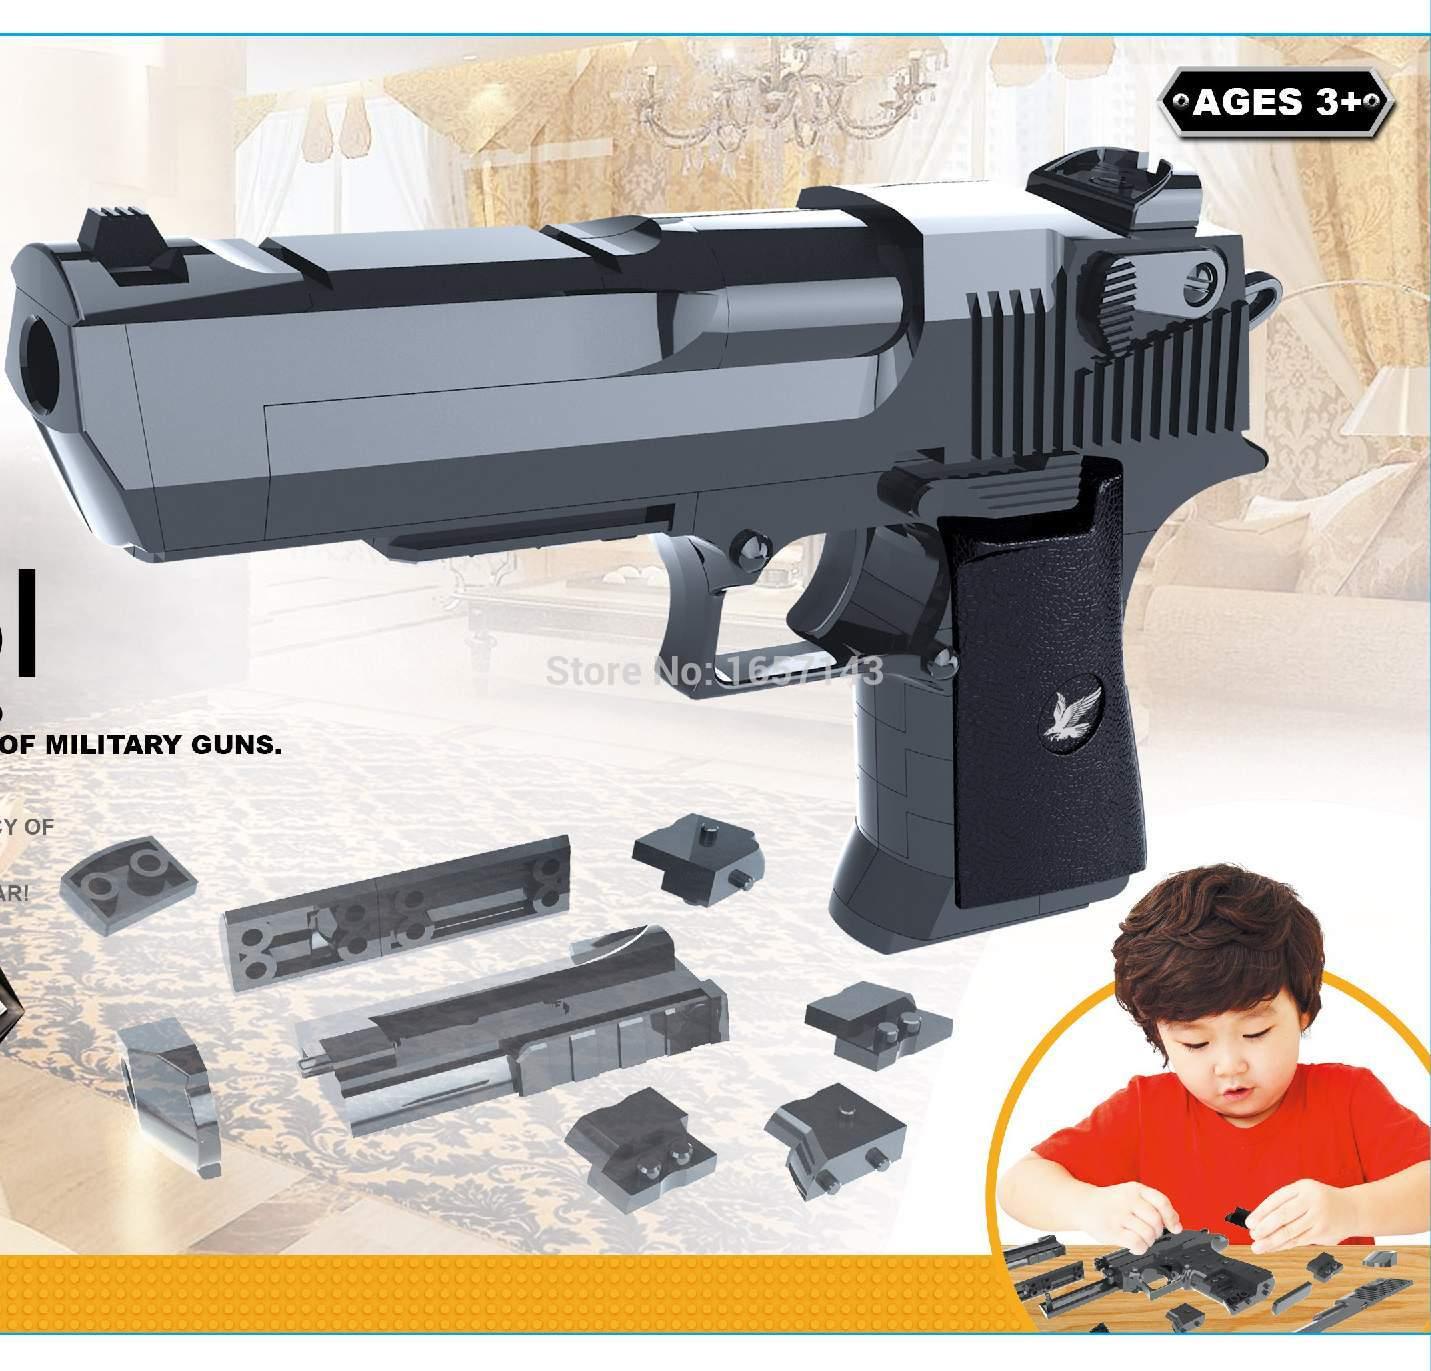 Educational toys assembling toy gun blocks 43pcs blocks can launch bullets(China (Mainland))